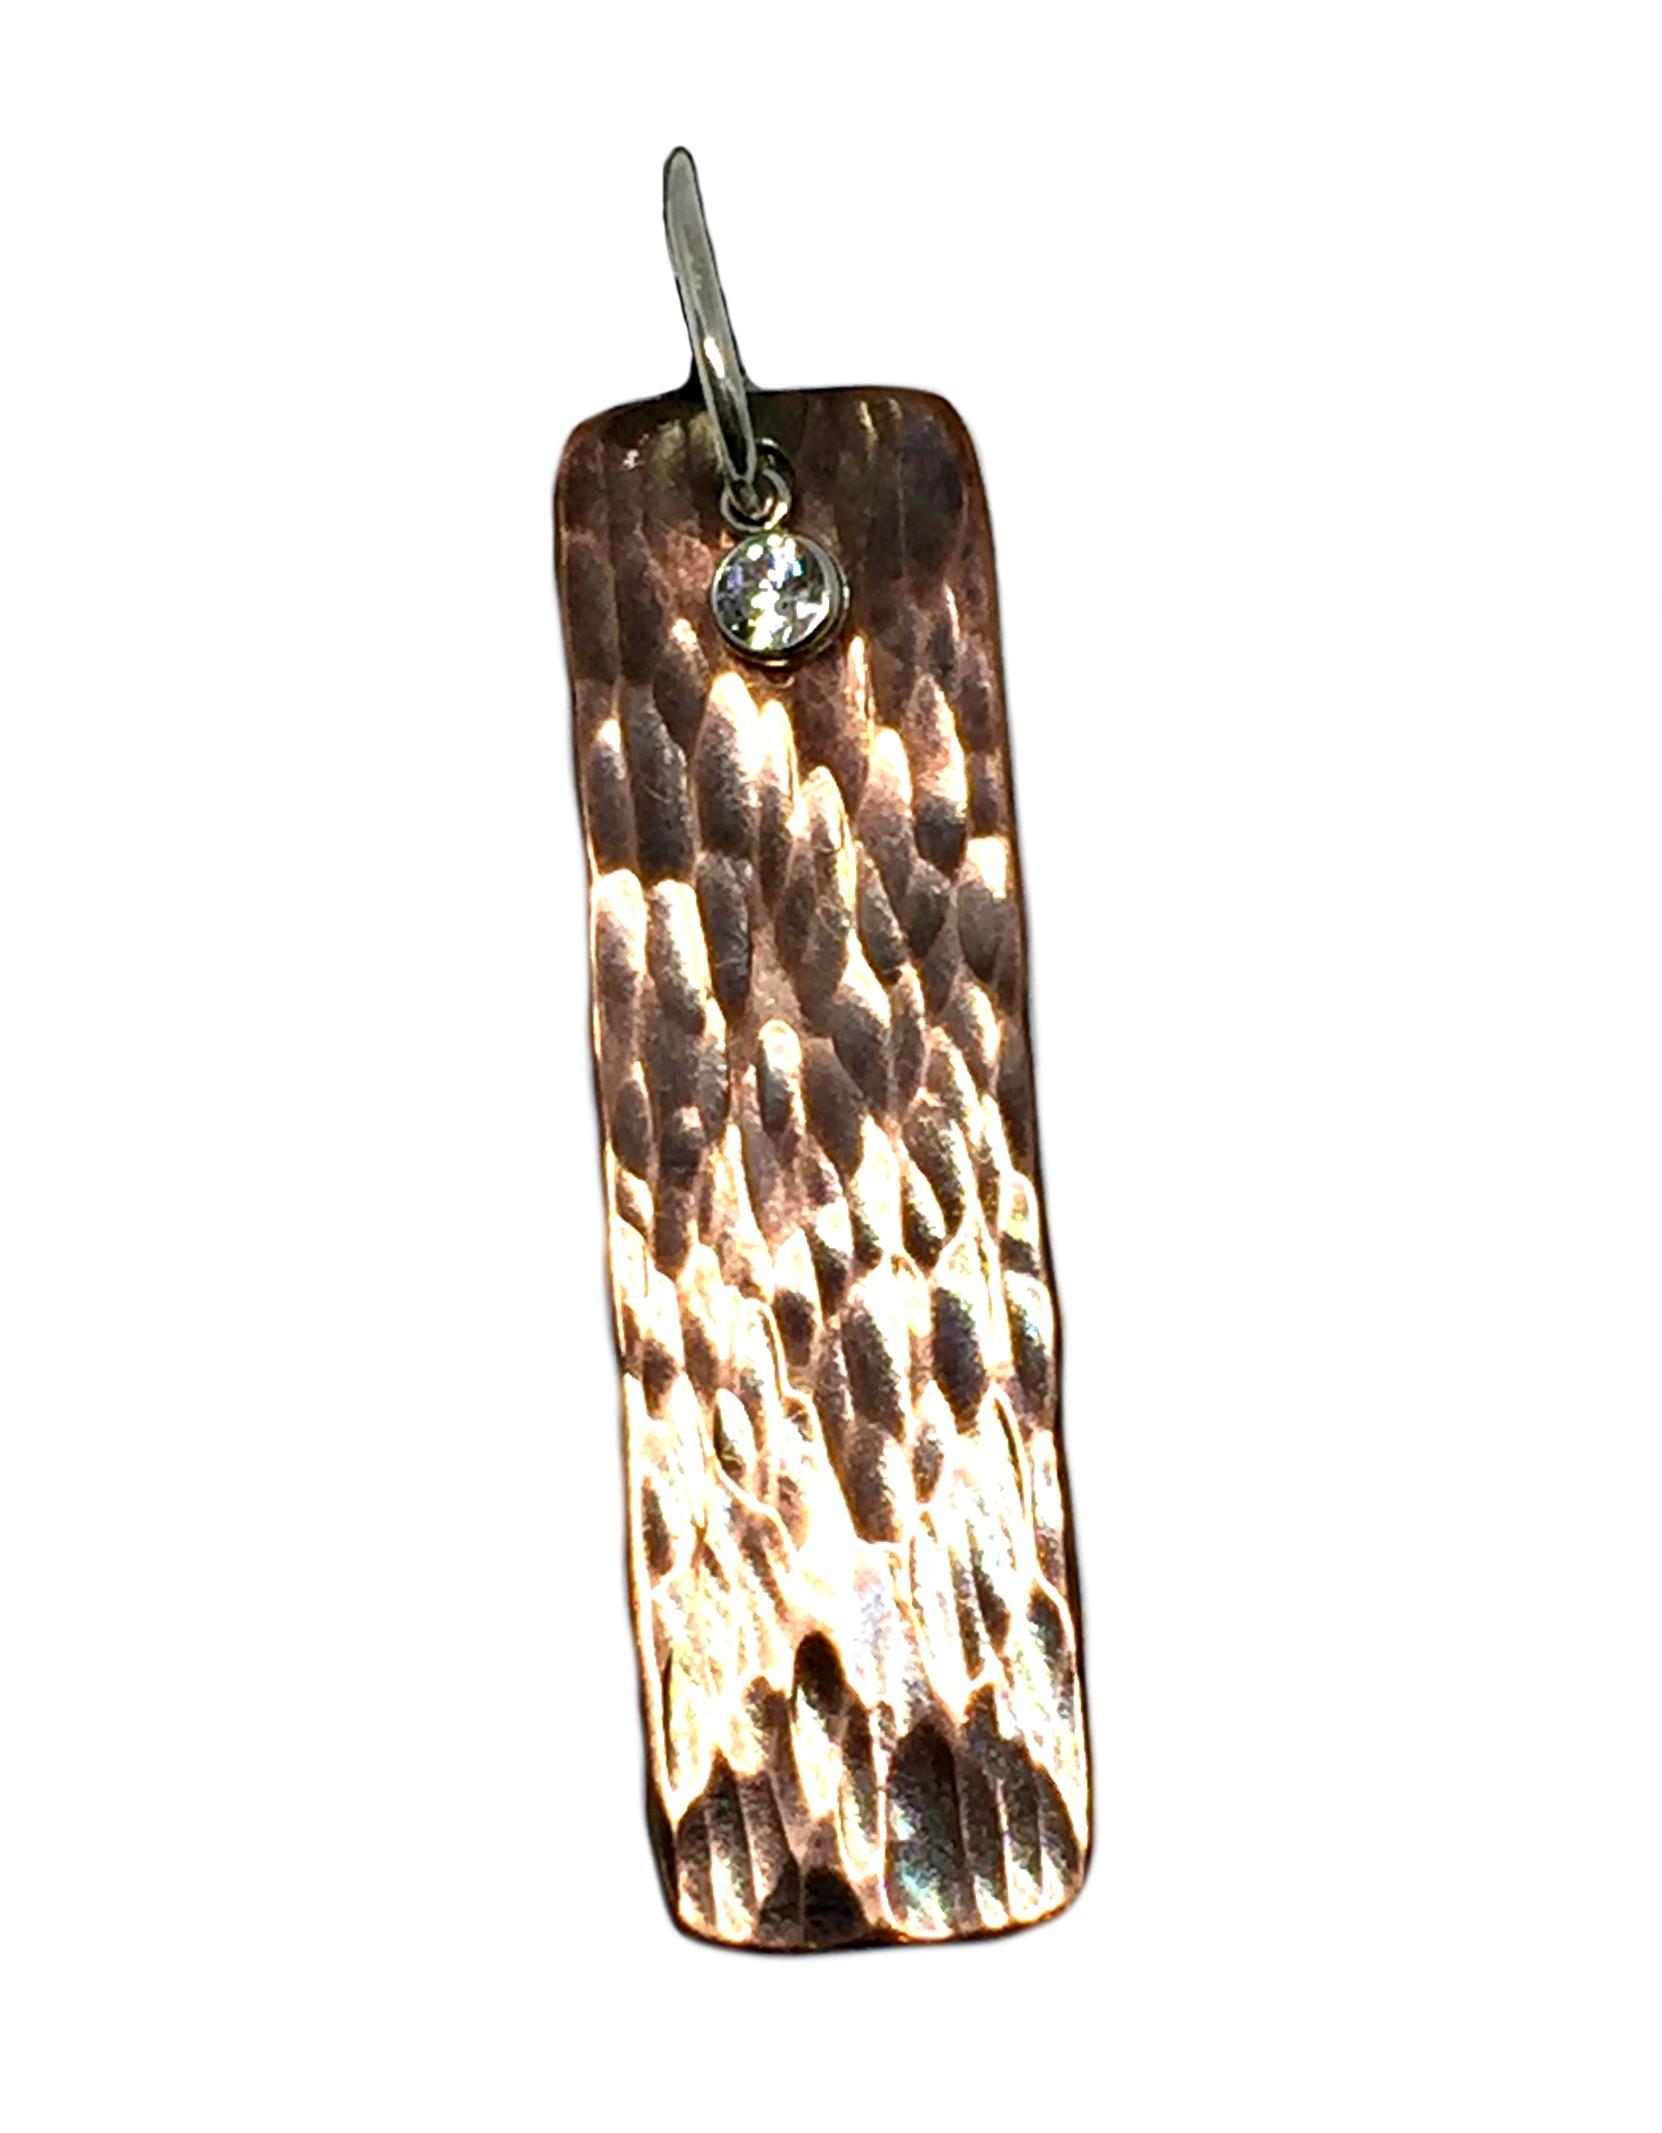 Copper, sterling silver, and CZ Karyn Chopik pendant | Effusion Art Gallery + Cast Glass Studio, Invermere BC